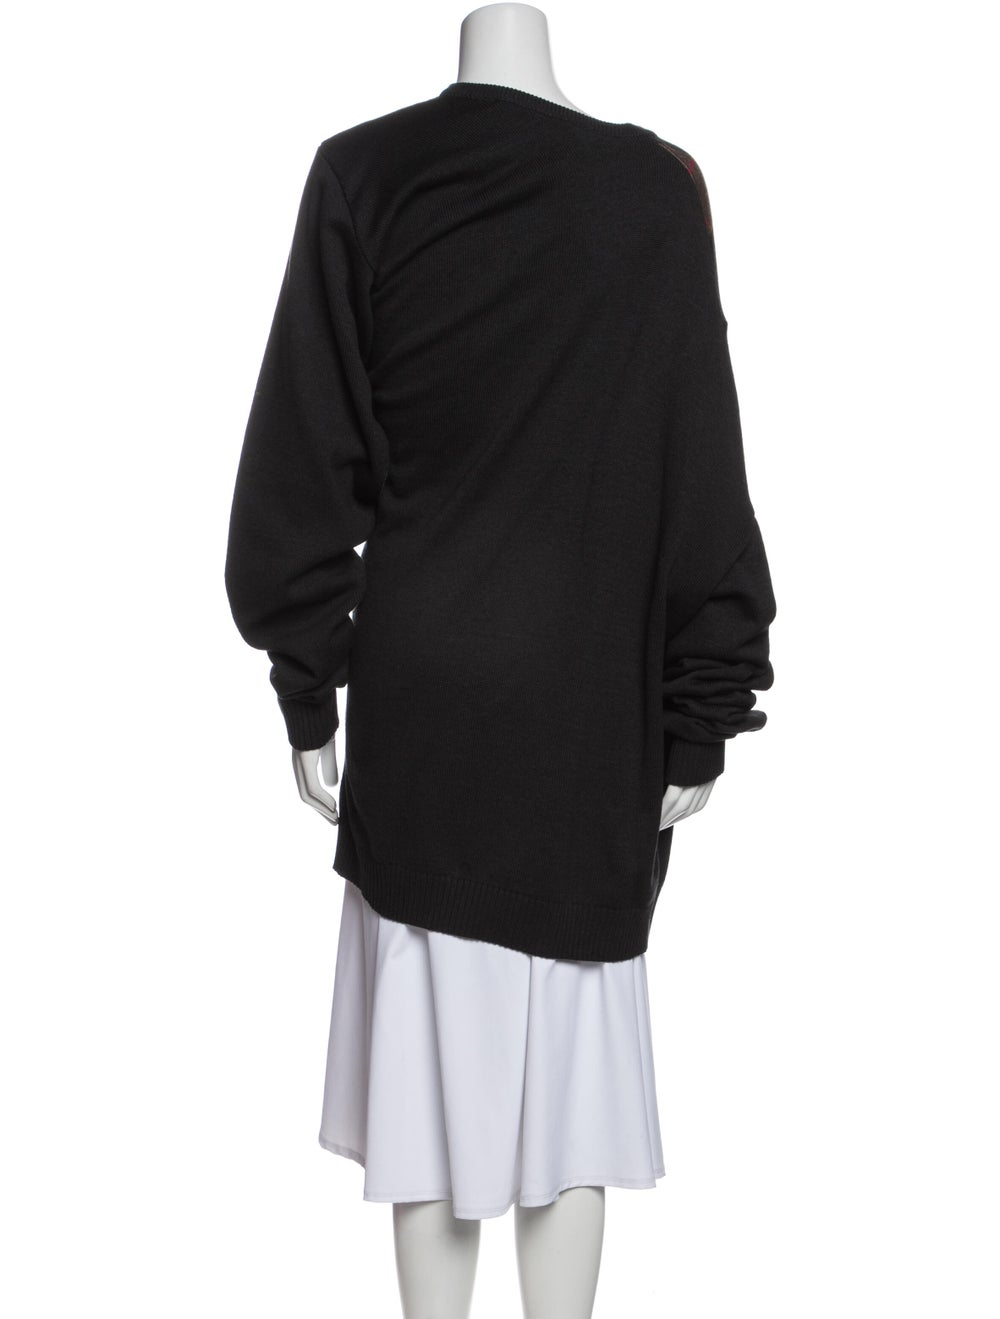 Y/Project Striped Bateau Neckline Sweater Black - image 3